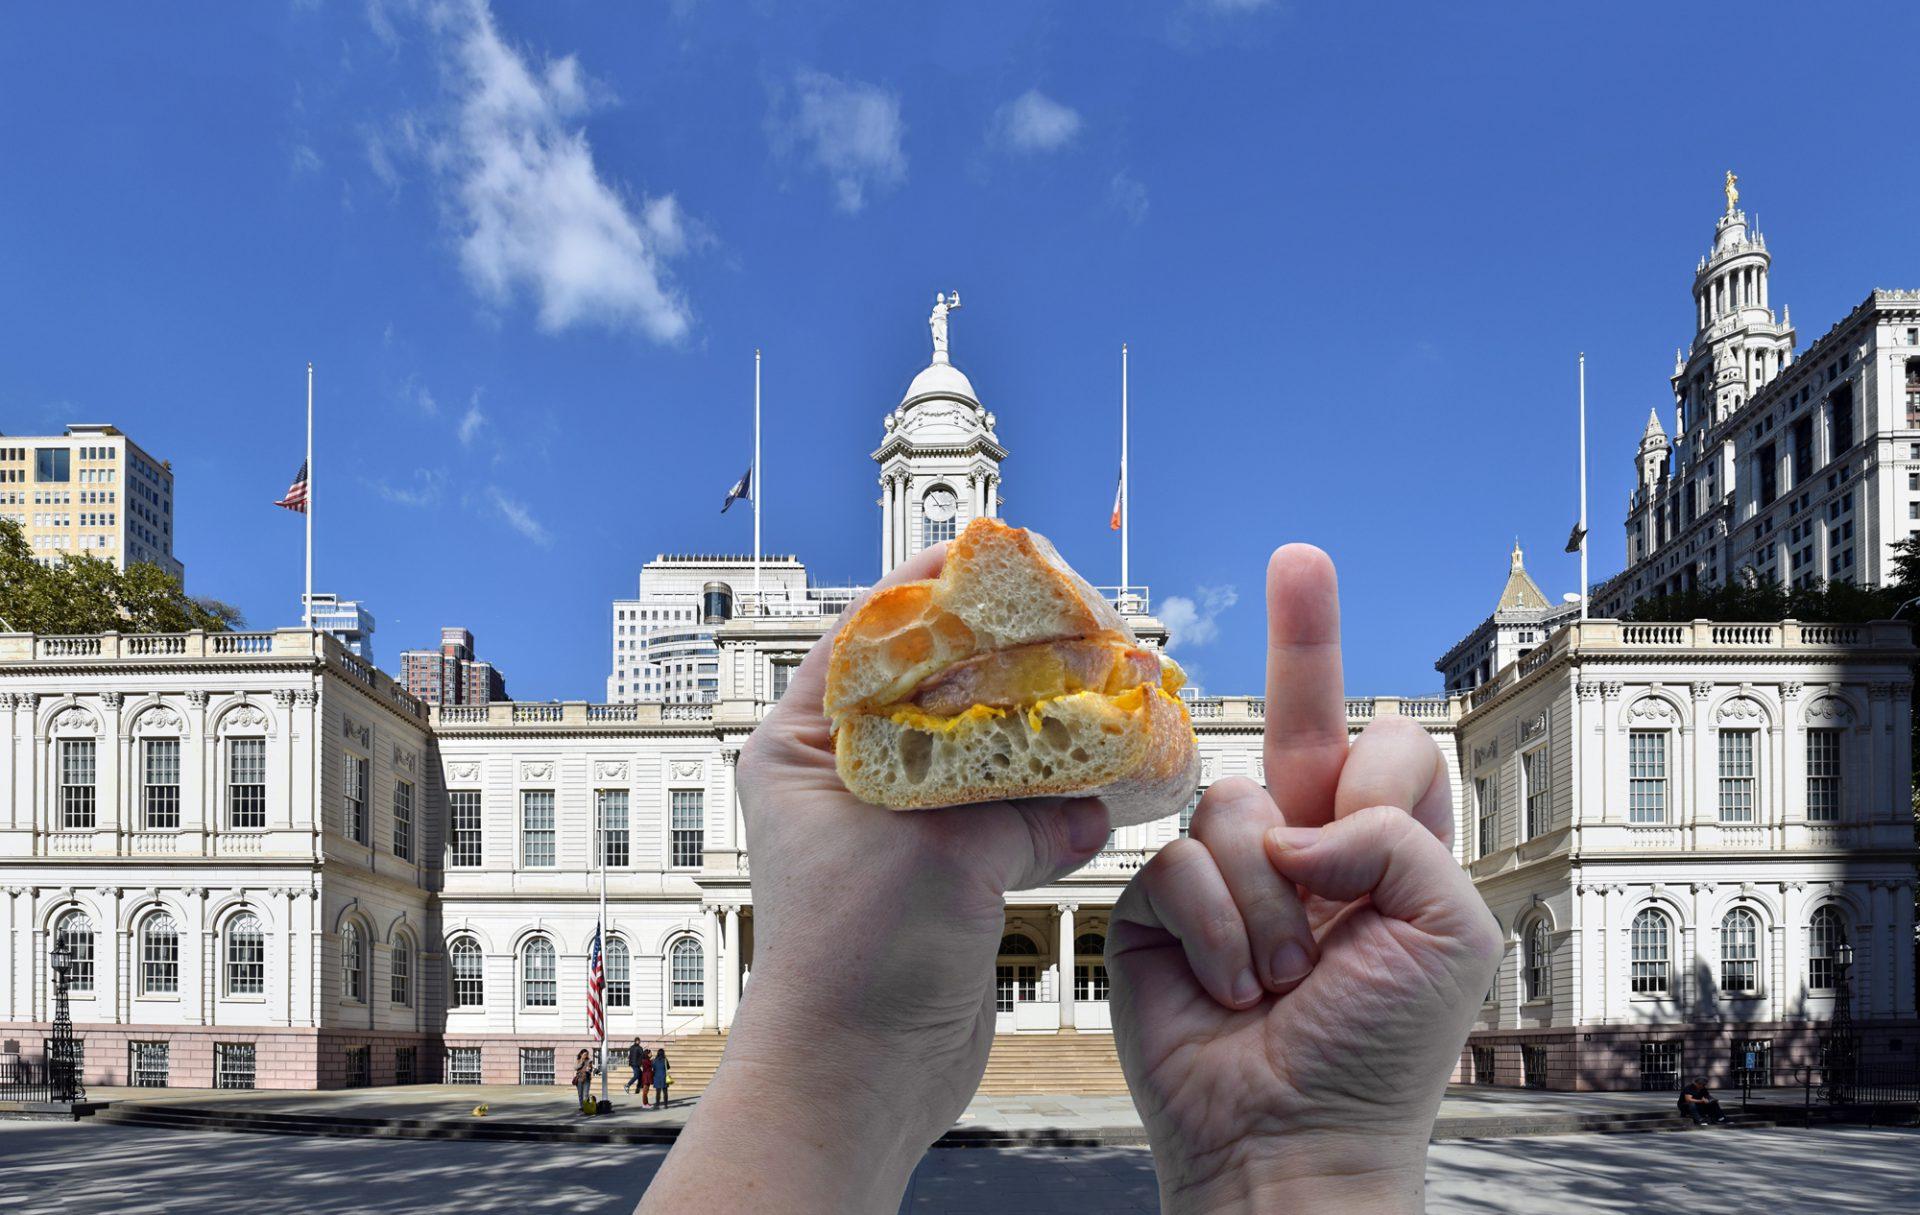 New York City Foie Gras Ban - Foie Gras Sandwich